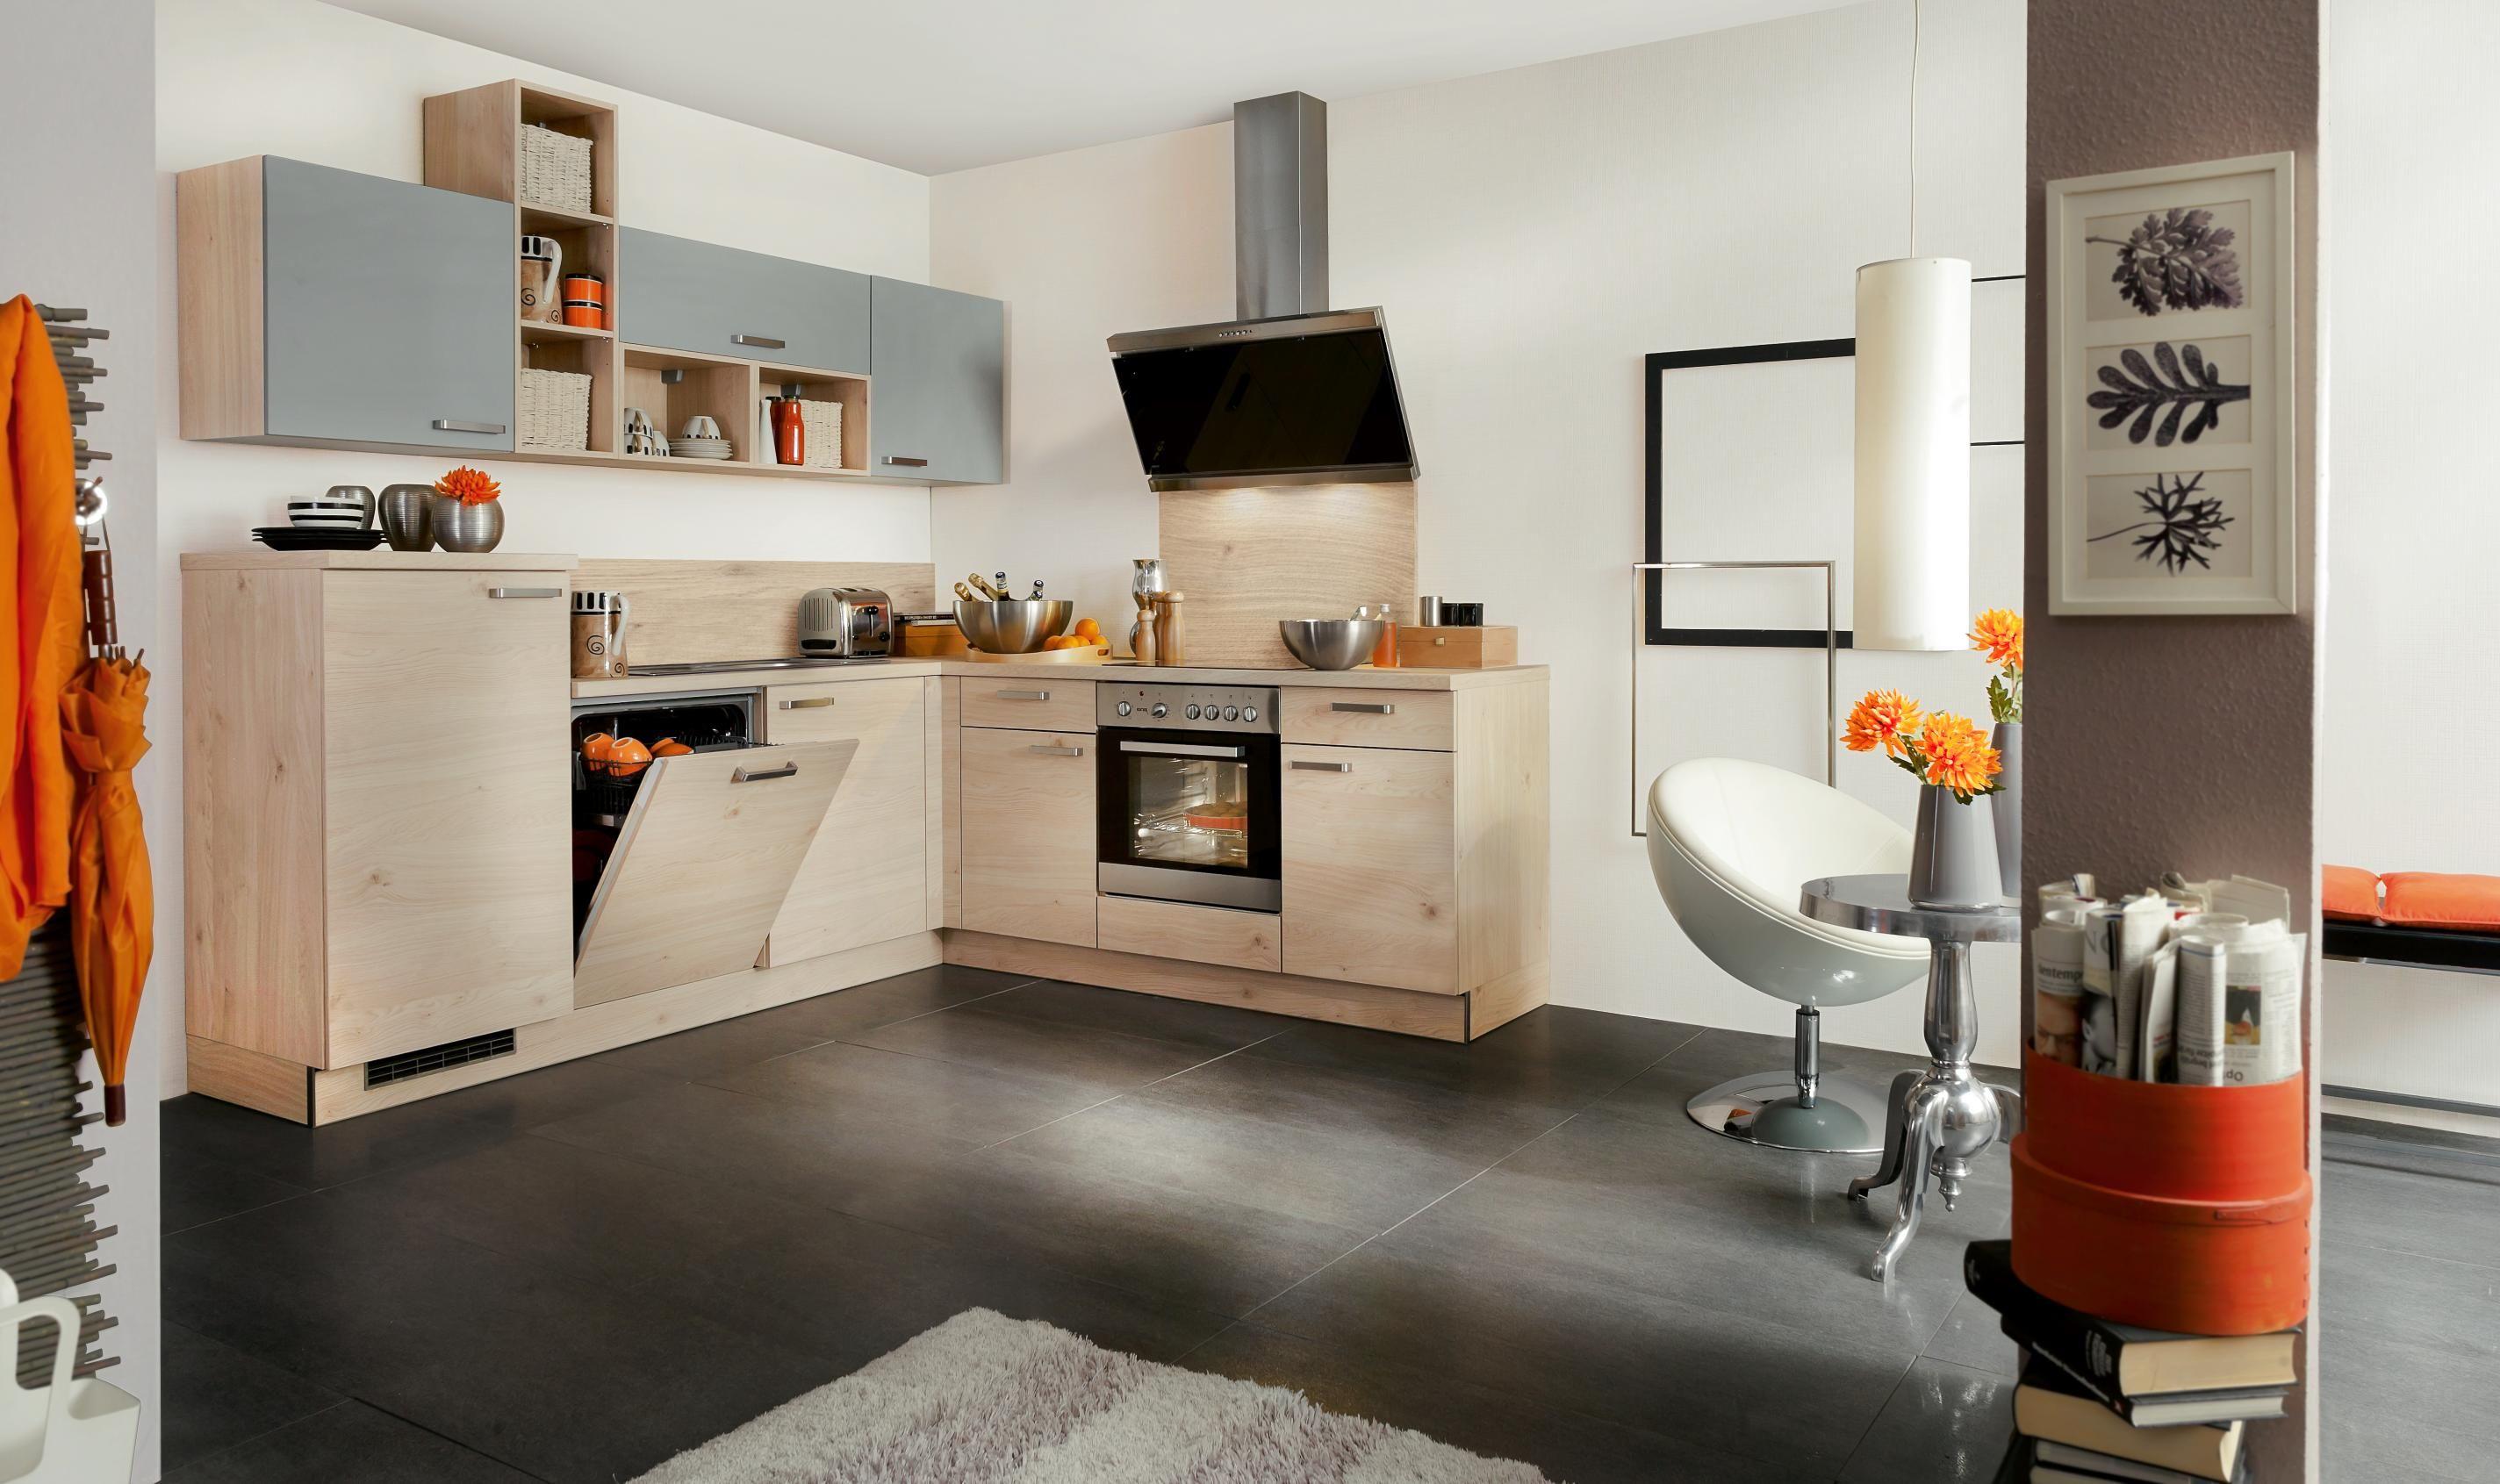 welnova eckk che k chenbl cke pinterest. Black Bedroom Furniture Sets. Home Design Ideas